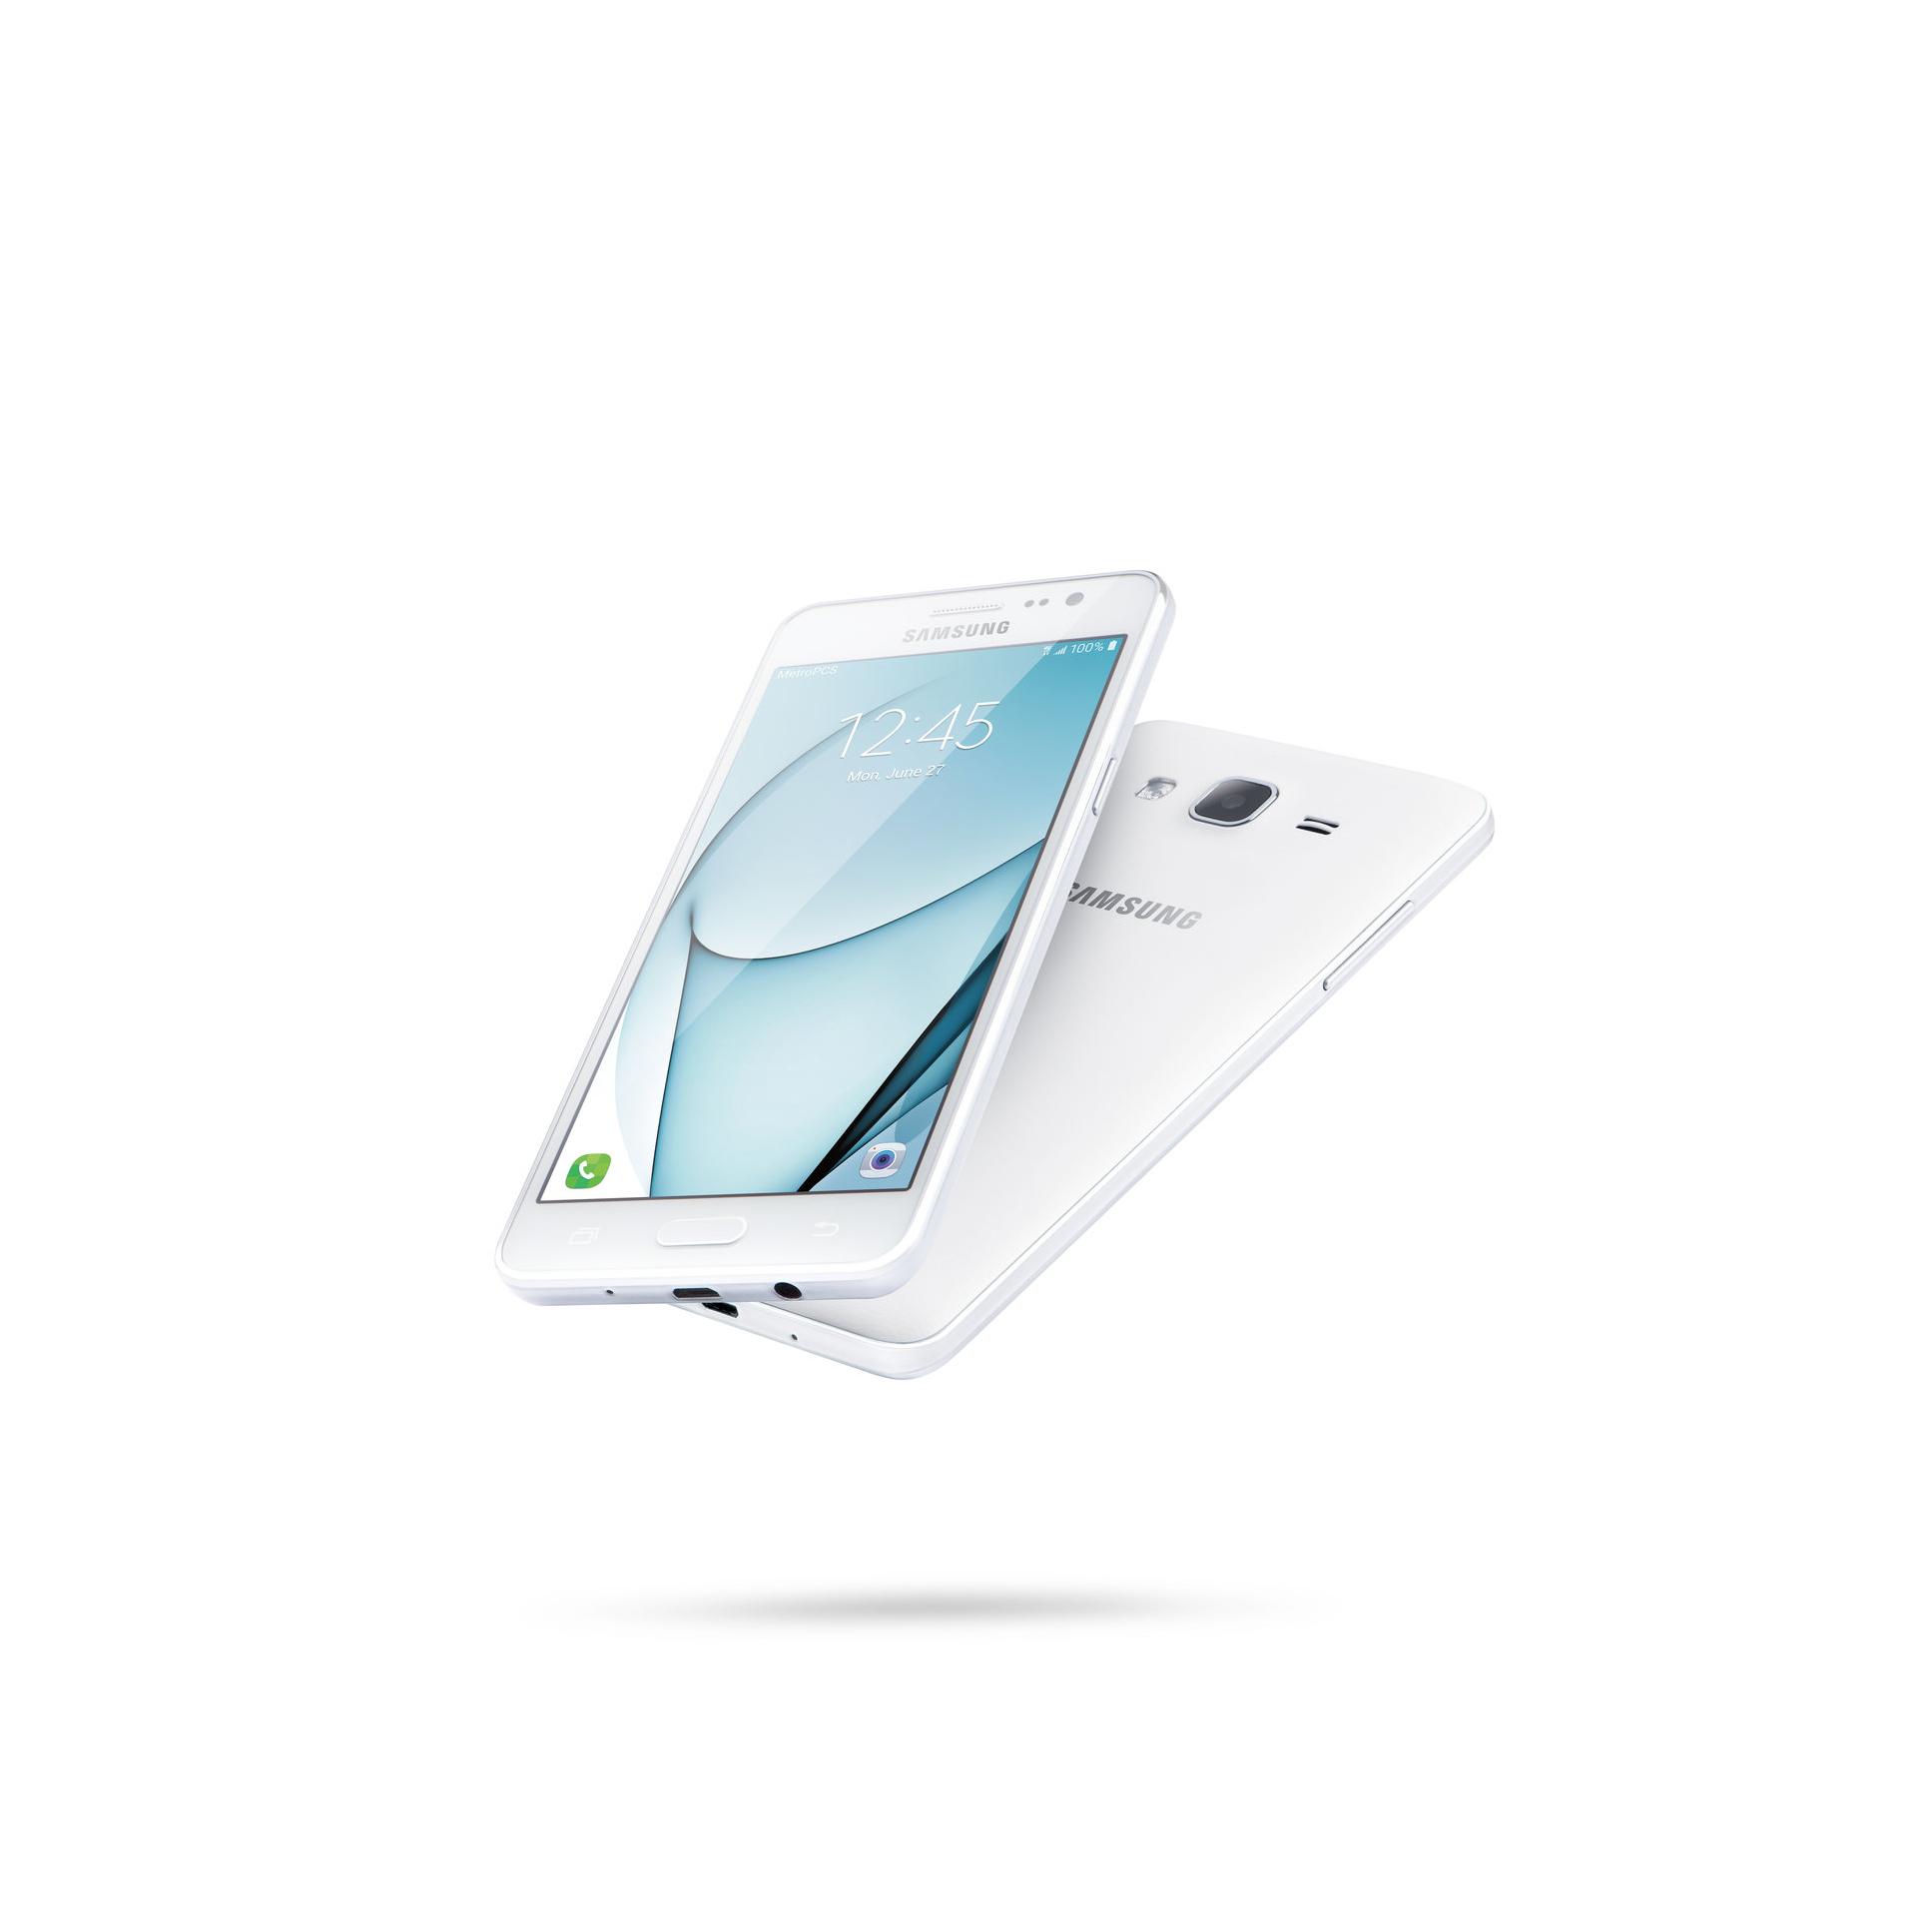 Samsung-Hero-web.jpg